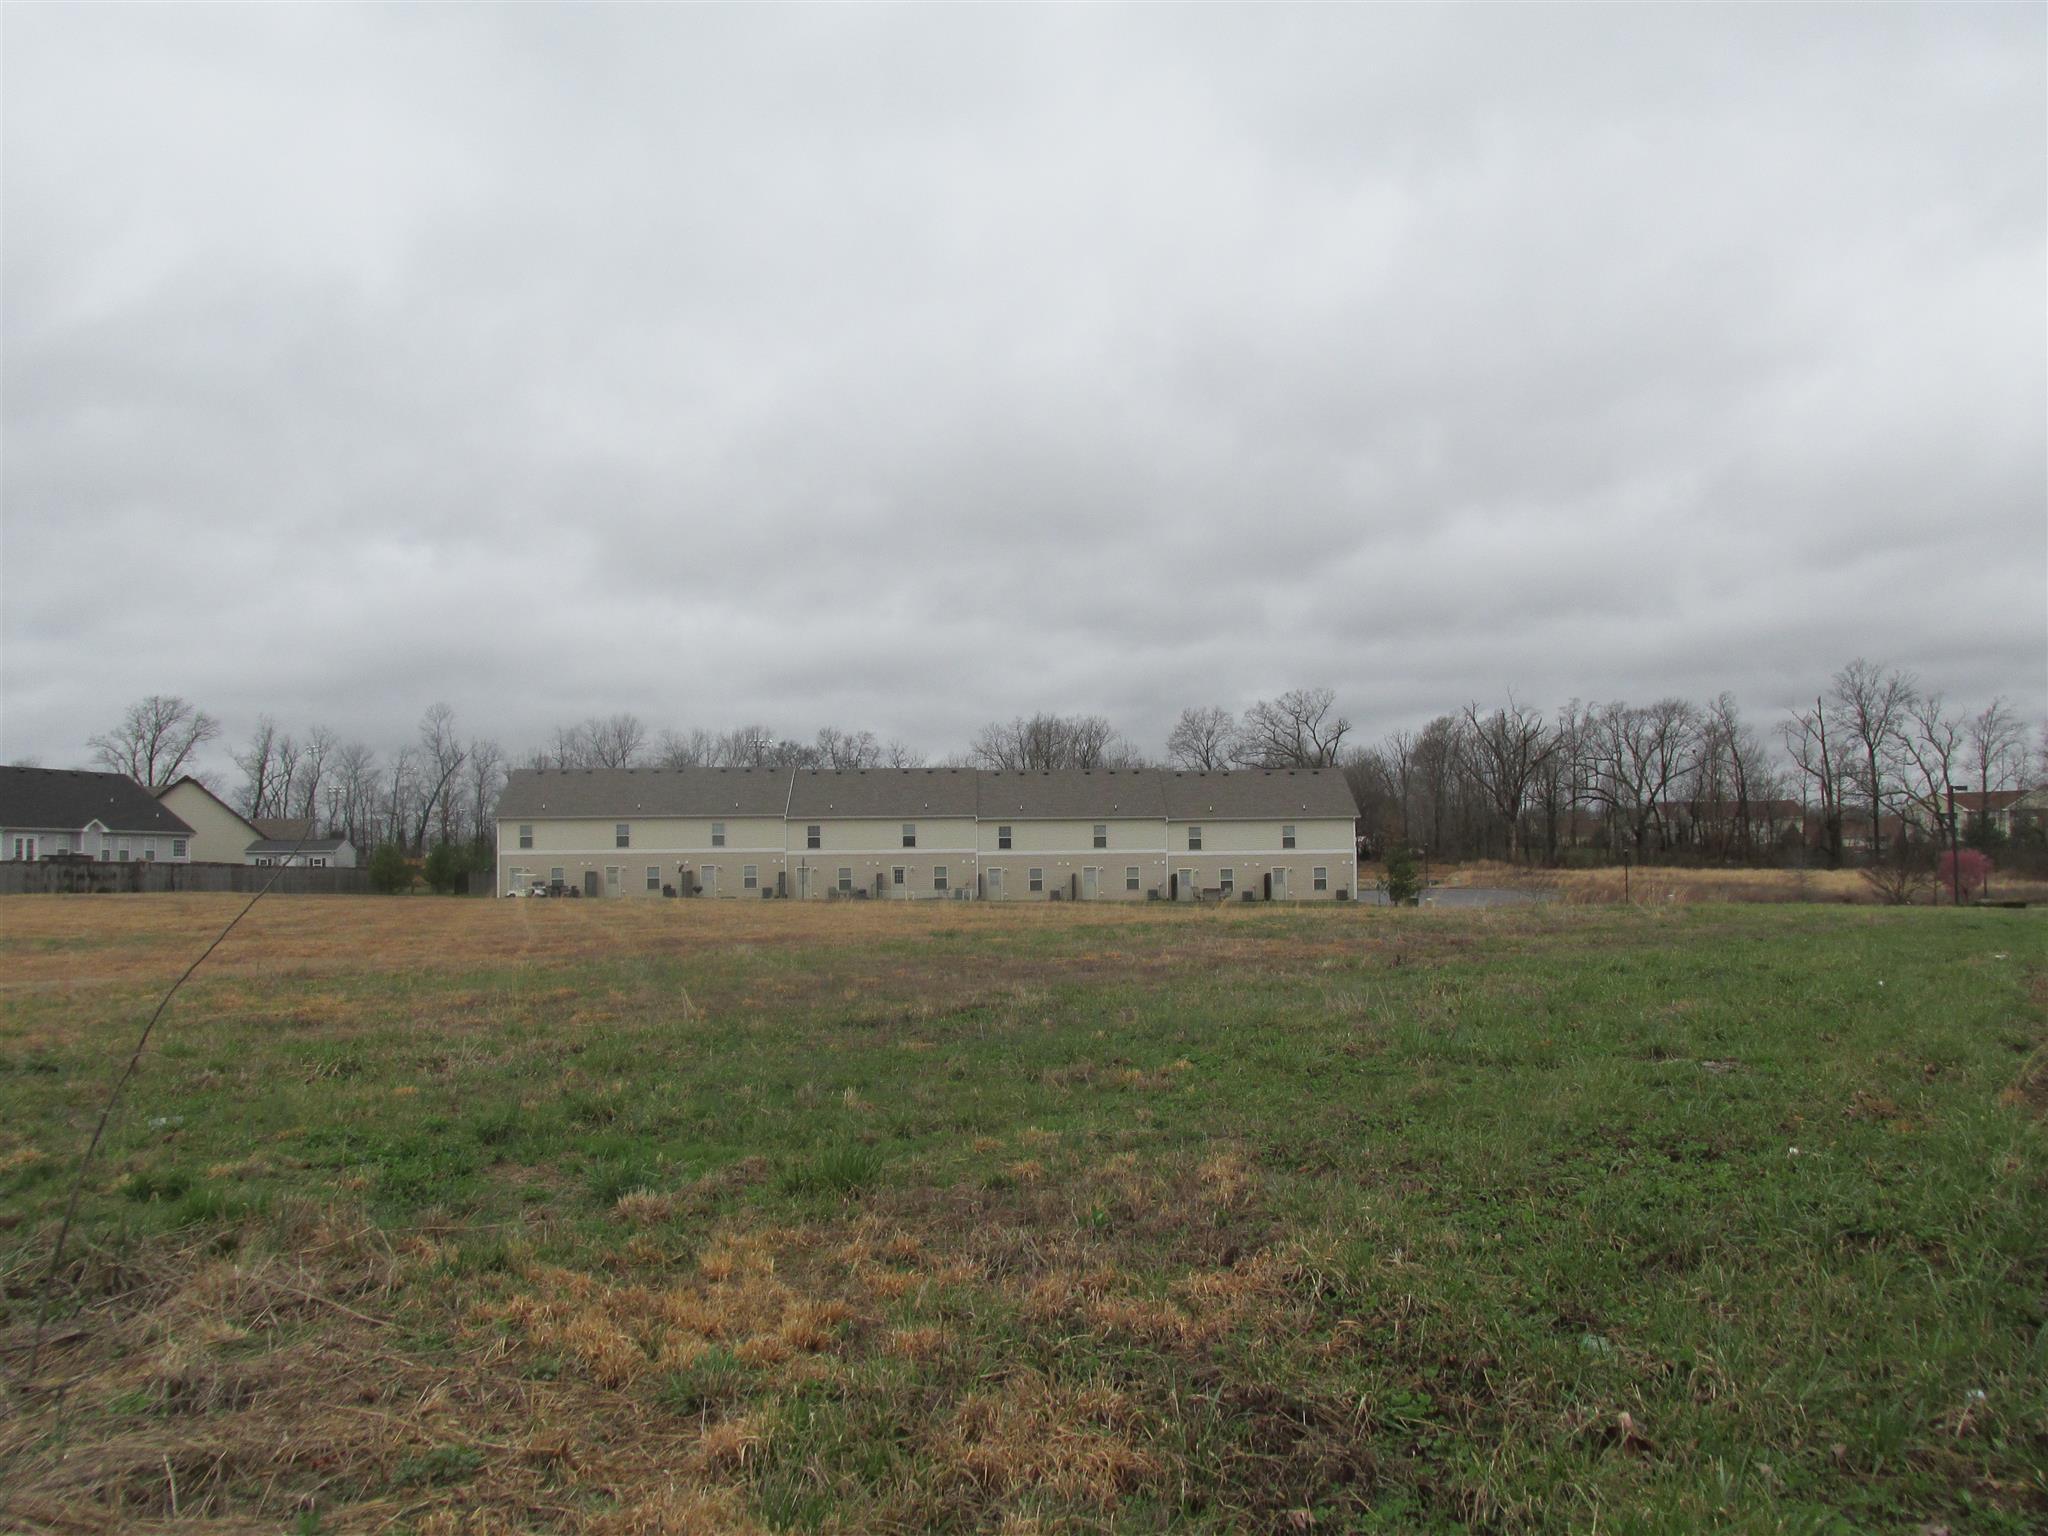 840 Professional Park Dr, Clarksville, TN 37040 - Clarksville, TN real estate listing